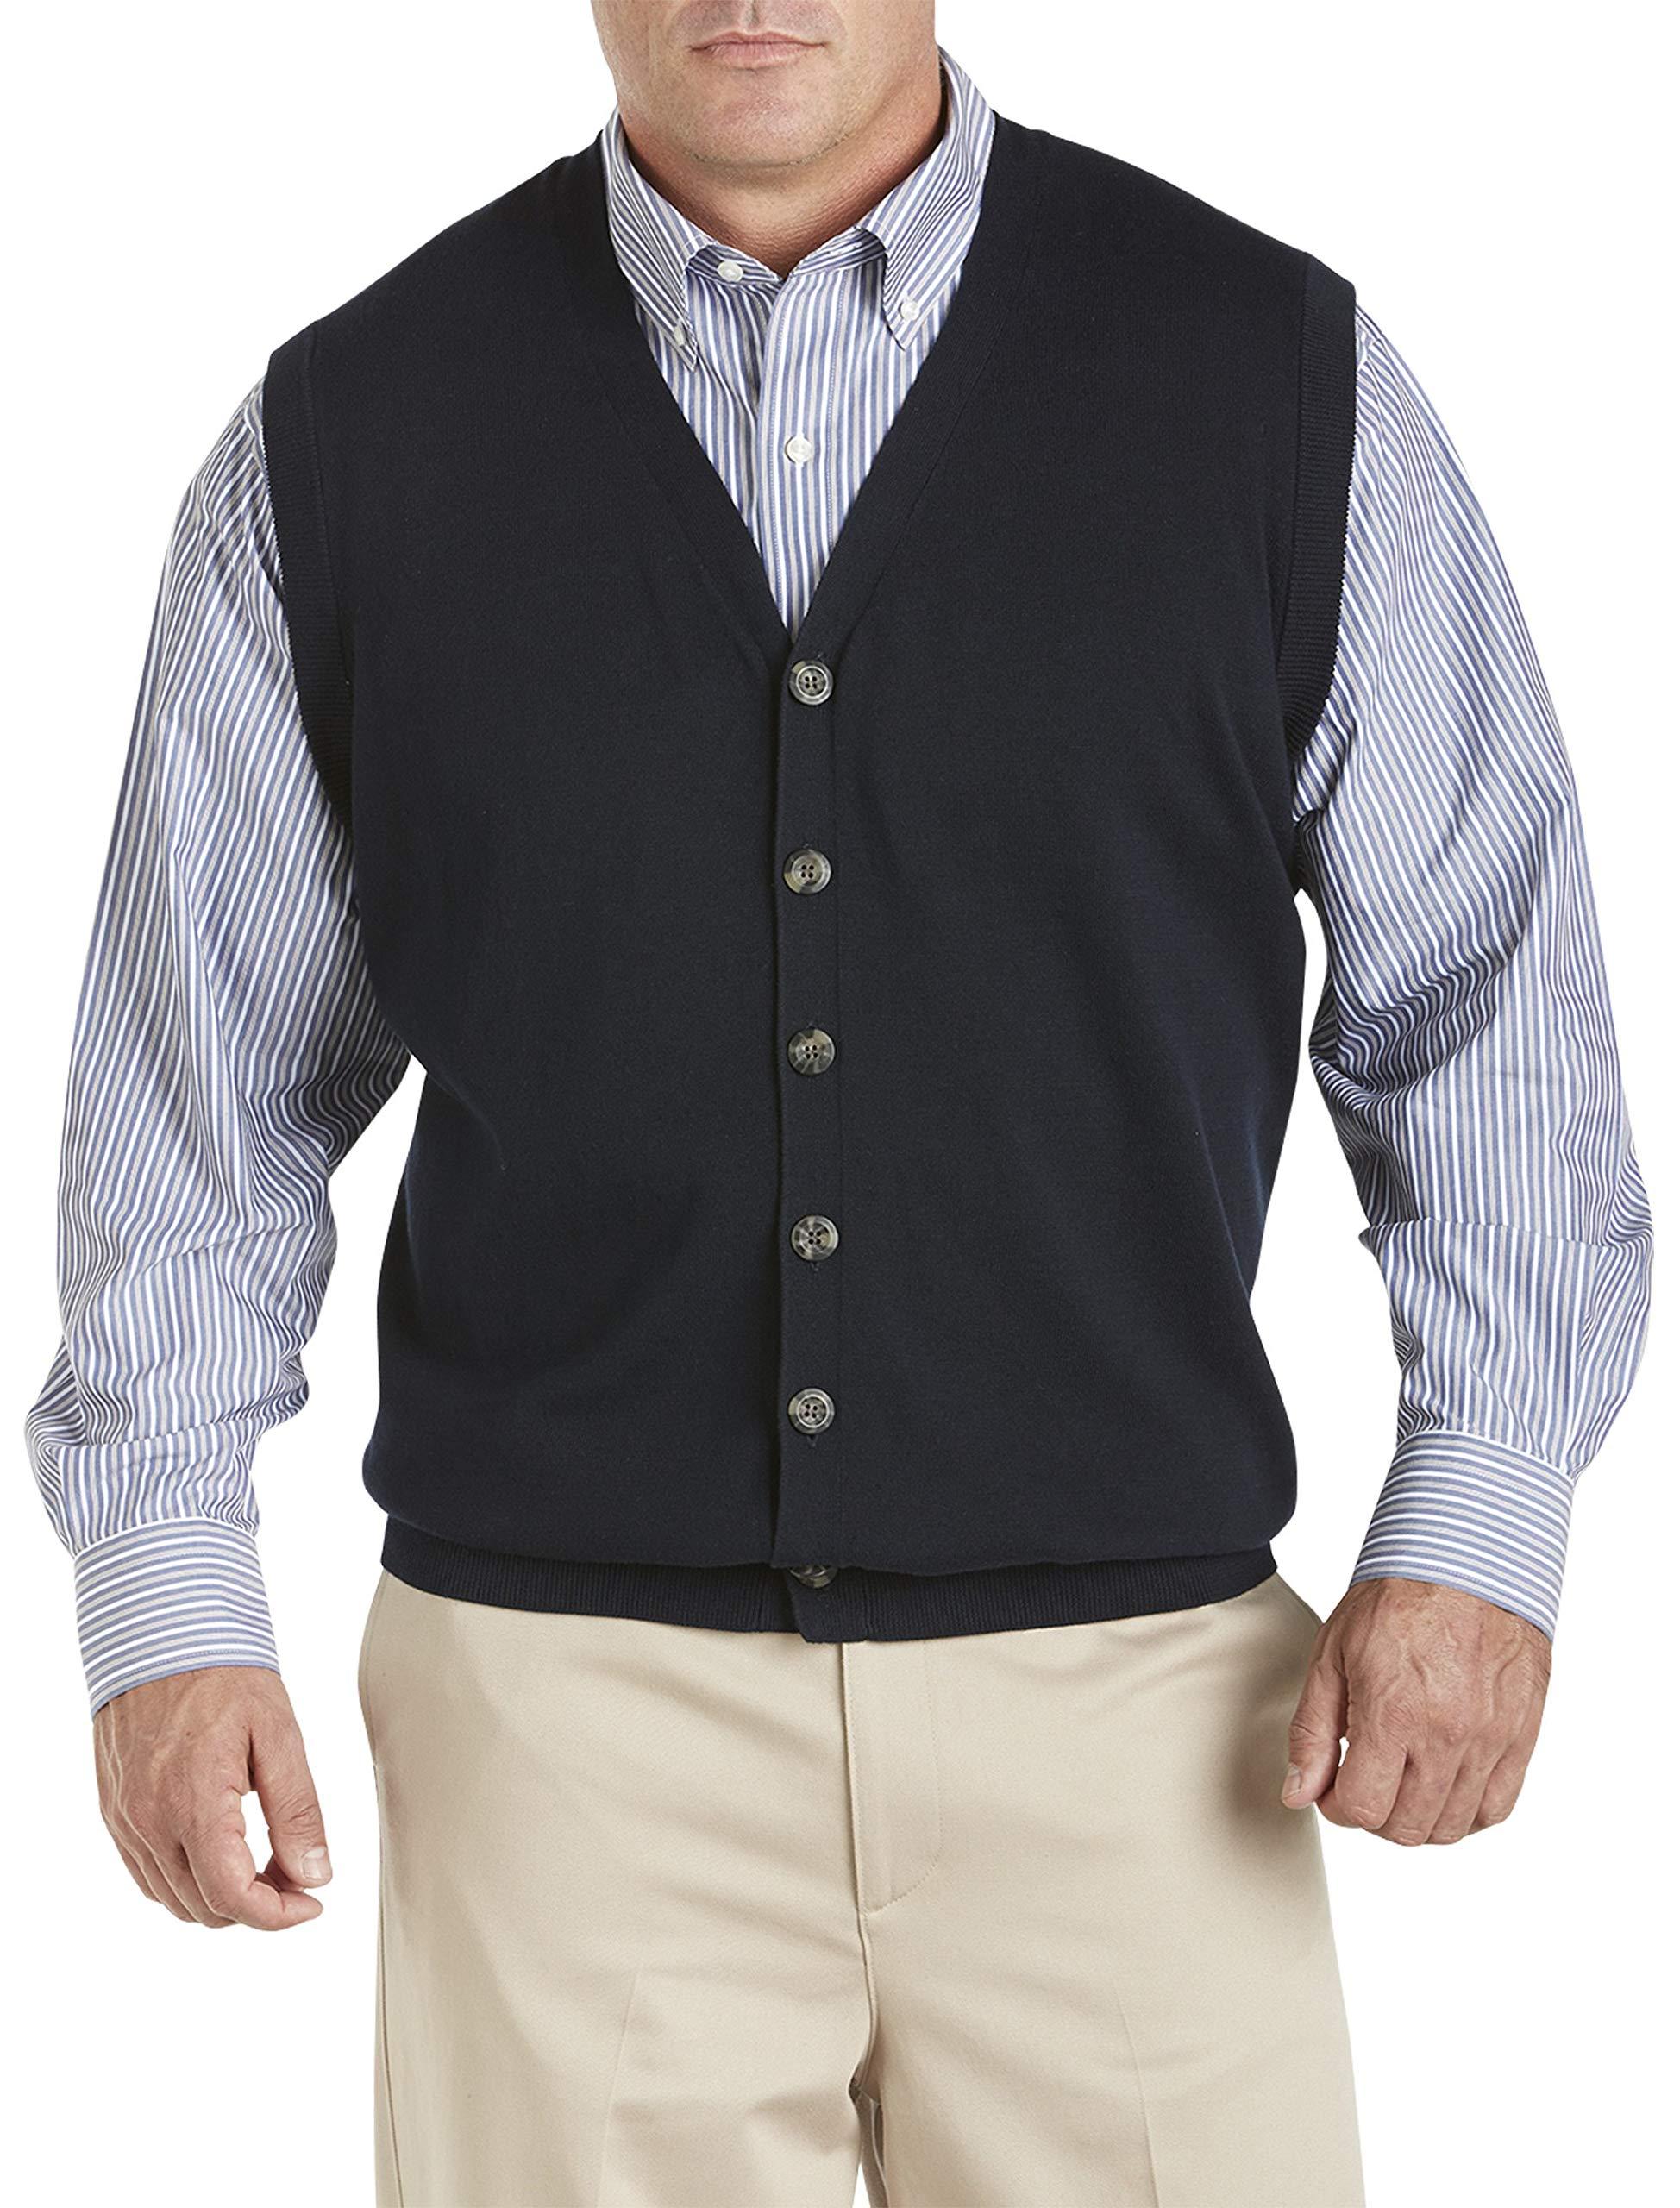 Oak Hill by DXL Big and Tall Button-Front Sweater Vest, Deep Navy 4XLT